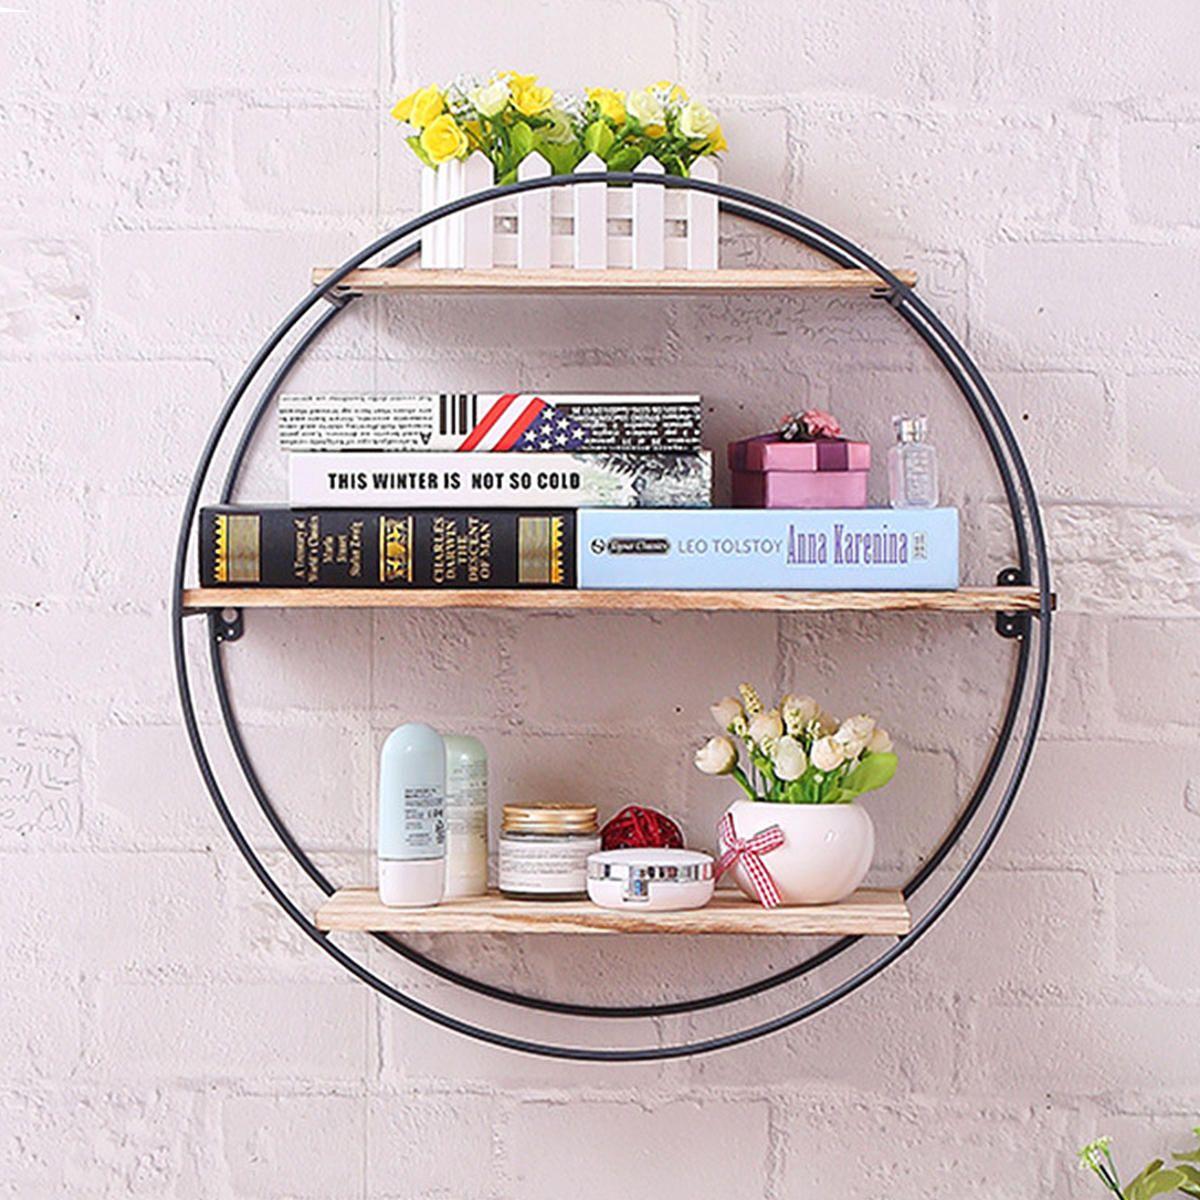 GYV US$54.10 Retro Round Wood Iron Craft Wall Shelf Rack Storage Industrial Style Home Decorations